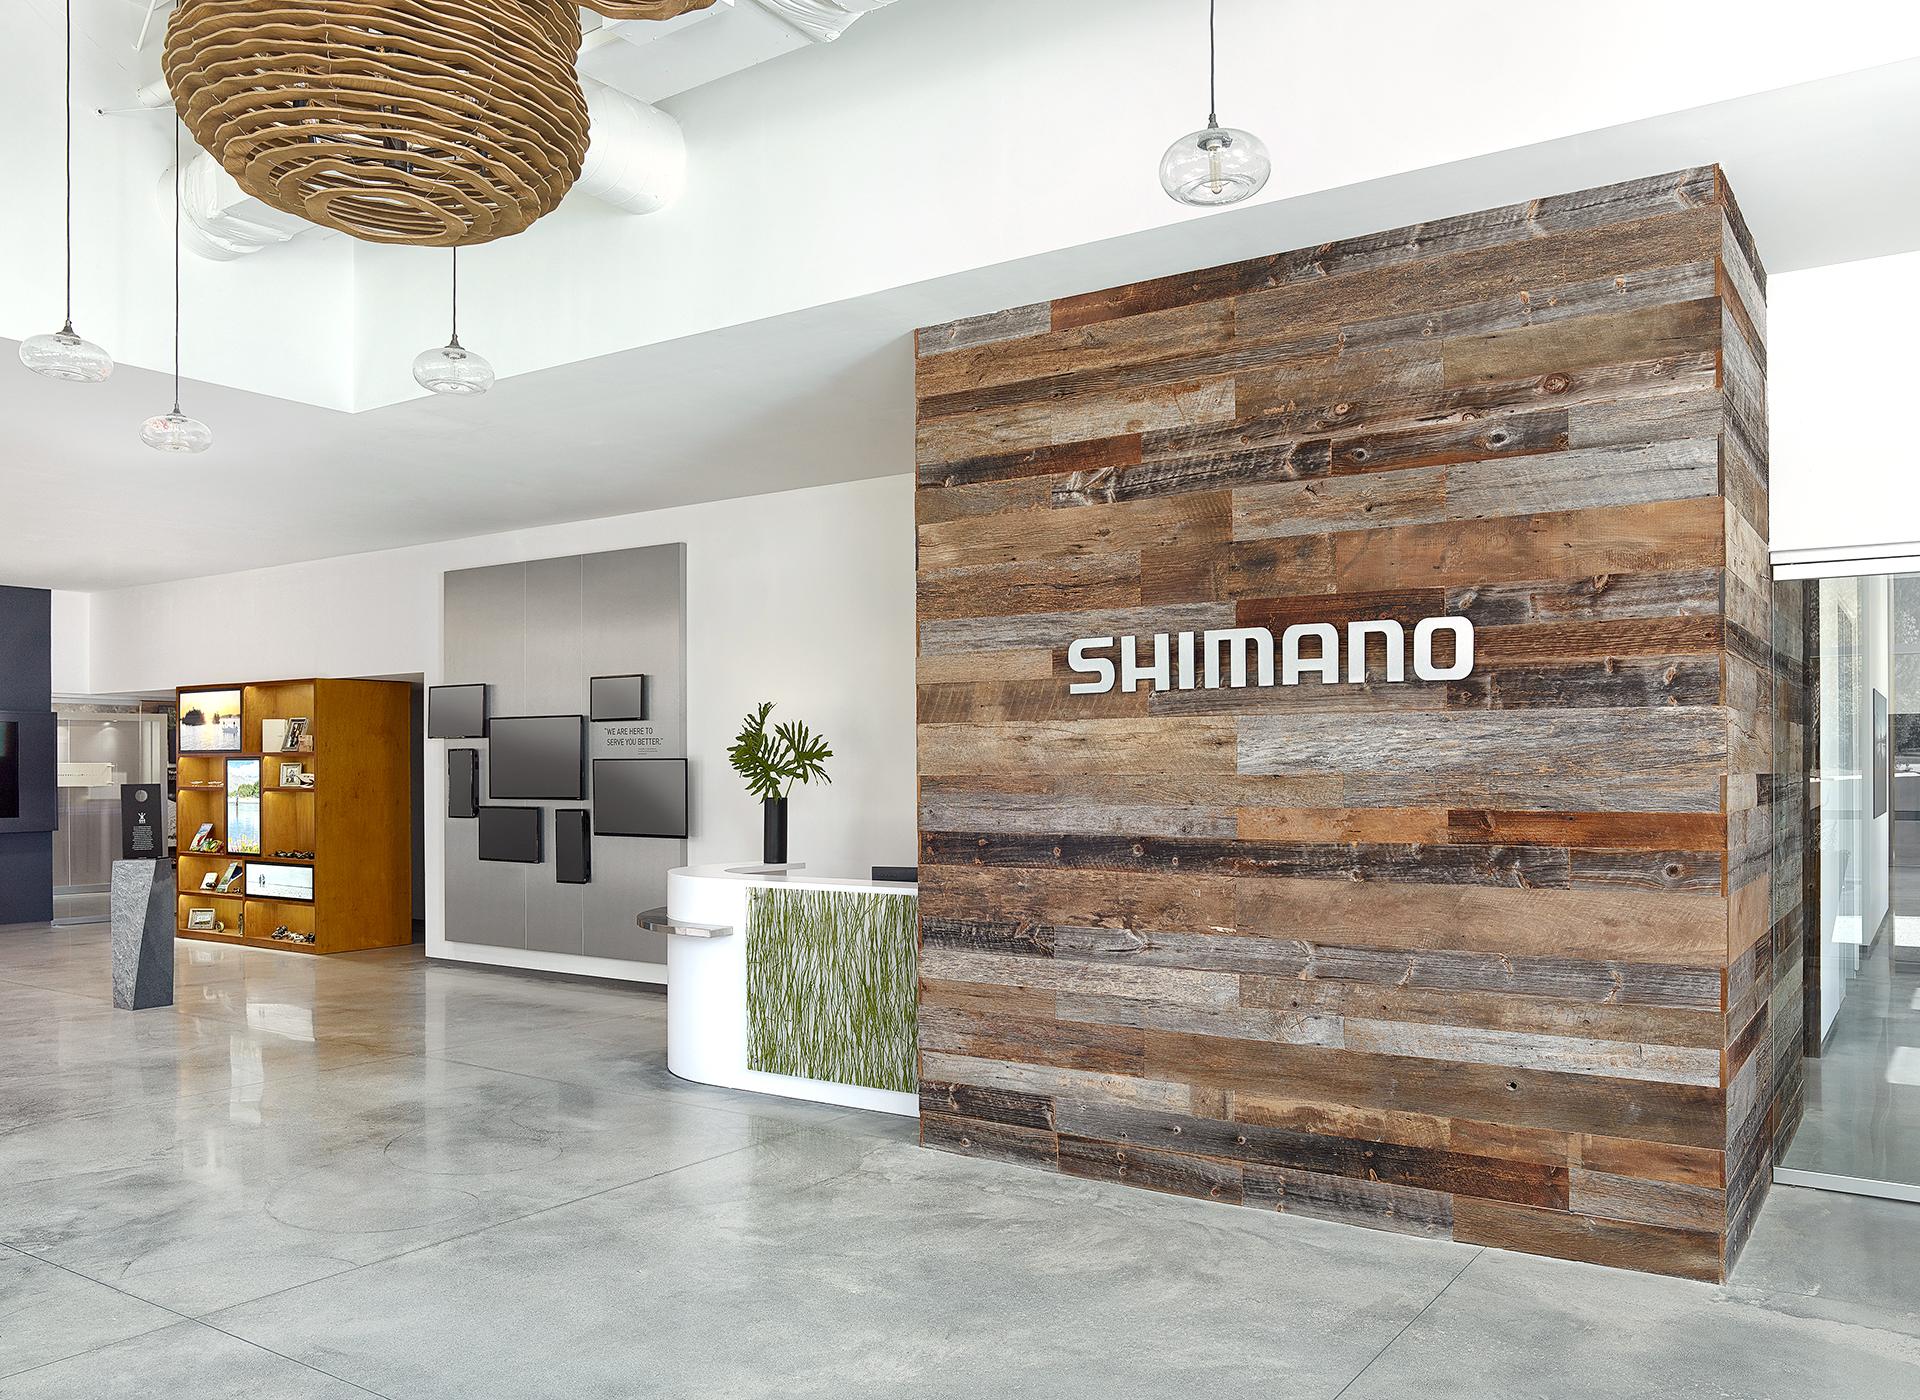 ©2017 Holger Obenaus Photography Interior Design Shimano